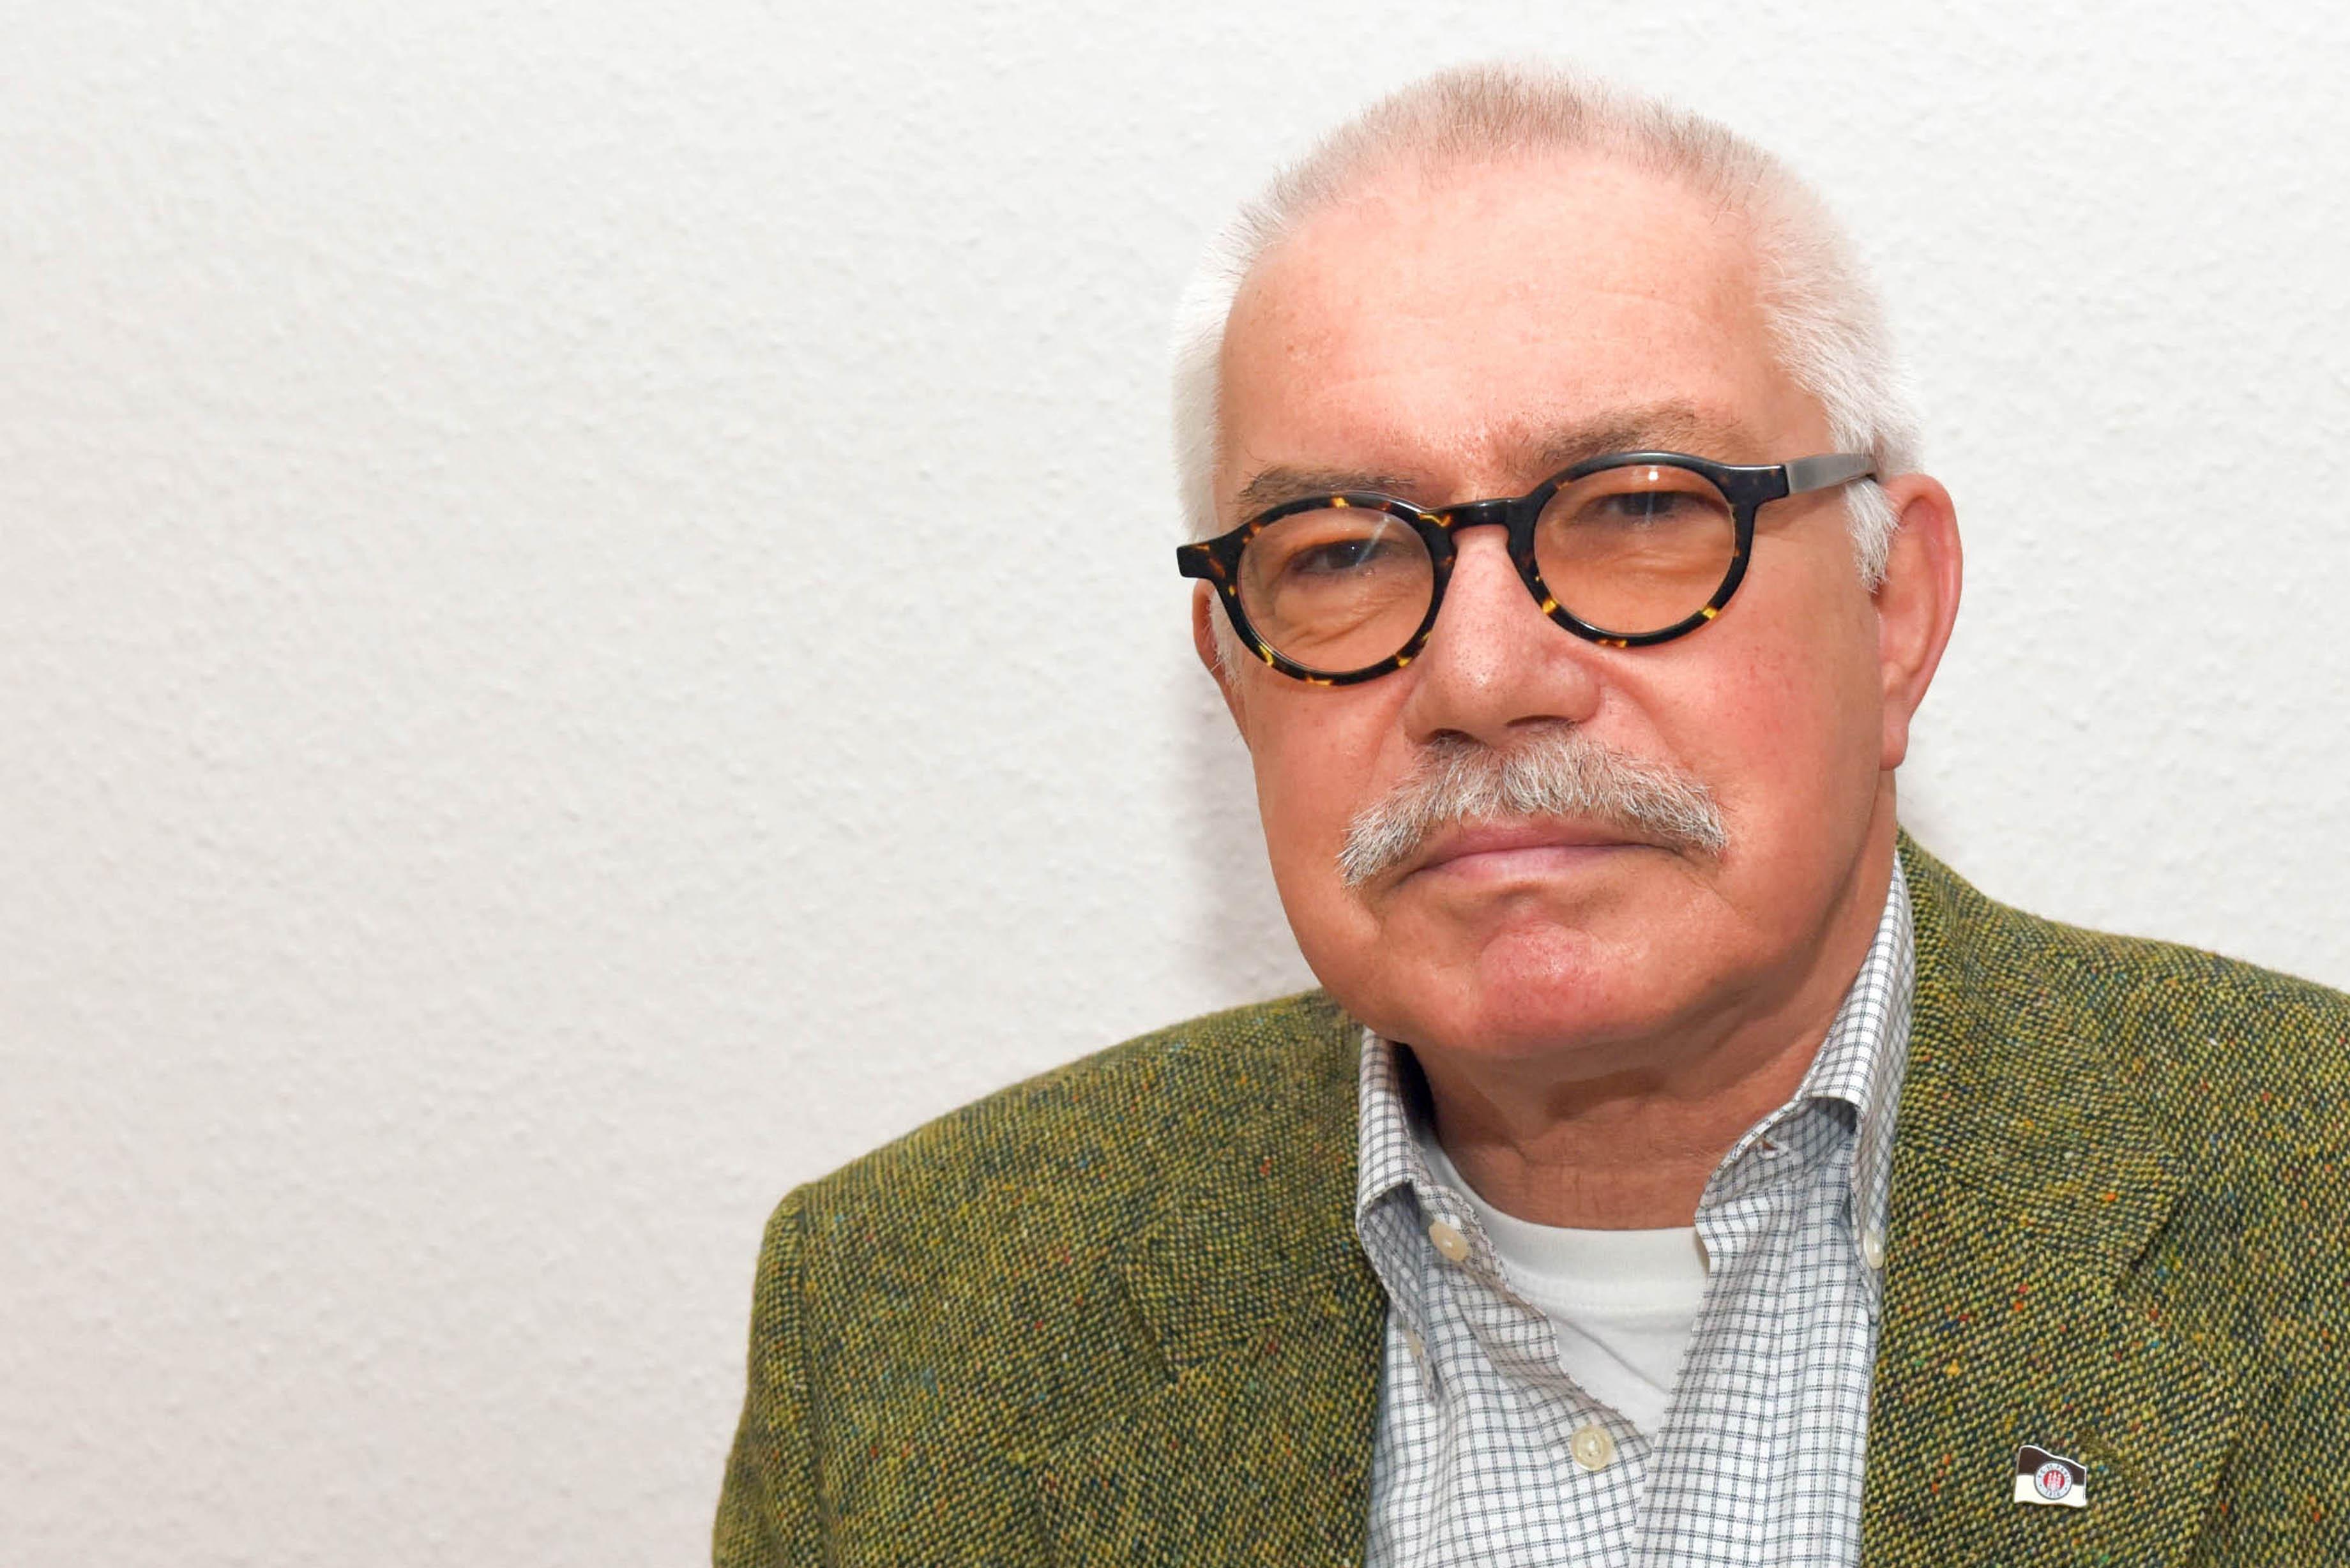 Brings, Jochen (stv. Vorsitzender)